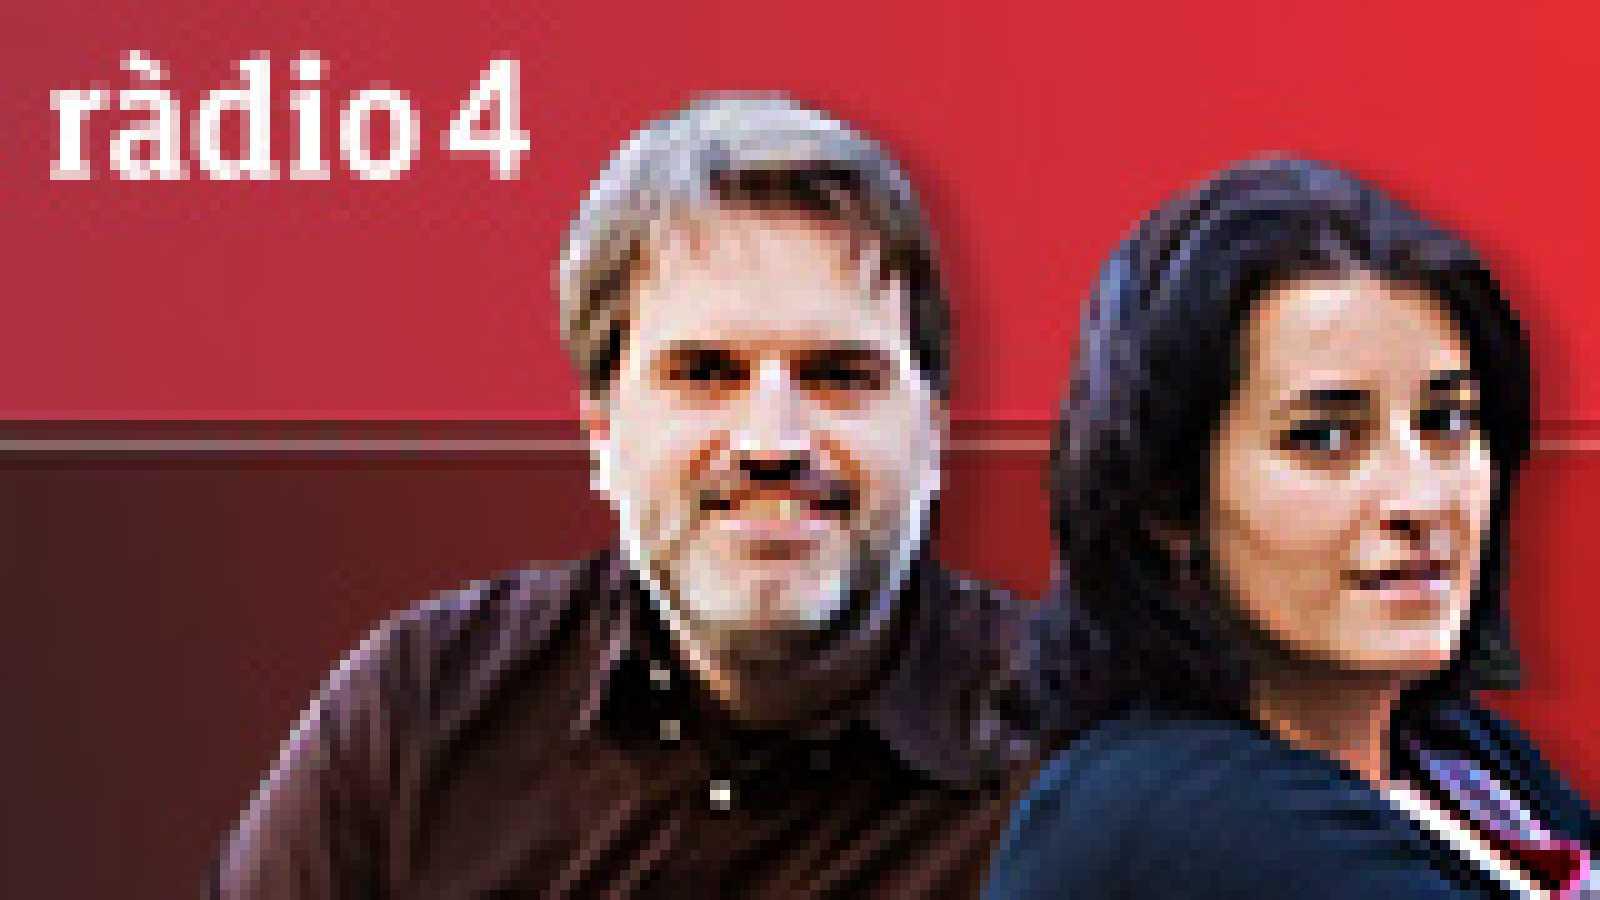 Entre Hores - Gregorio Luri. Christian Escribà. Meteorologia amb Roger Solé. Entrevista José Manuel Pagán. Josep Cabayol de SICOM